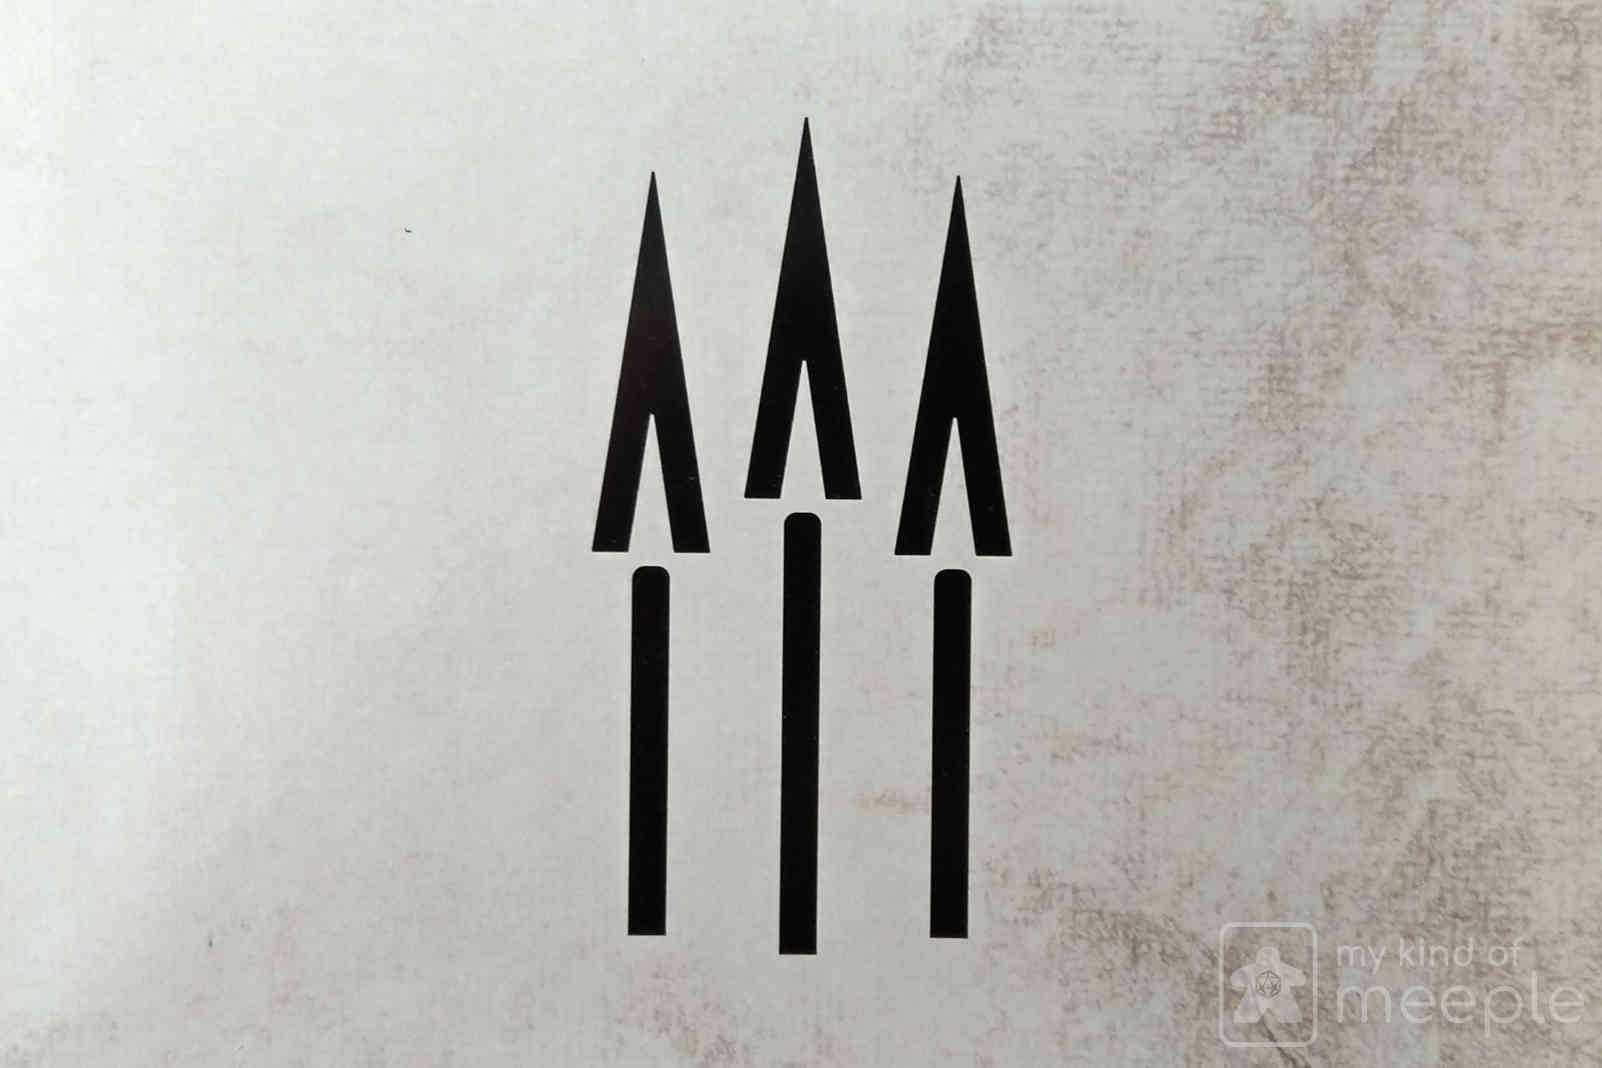 Gloomhaven Quartermaster three spears symbol